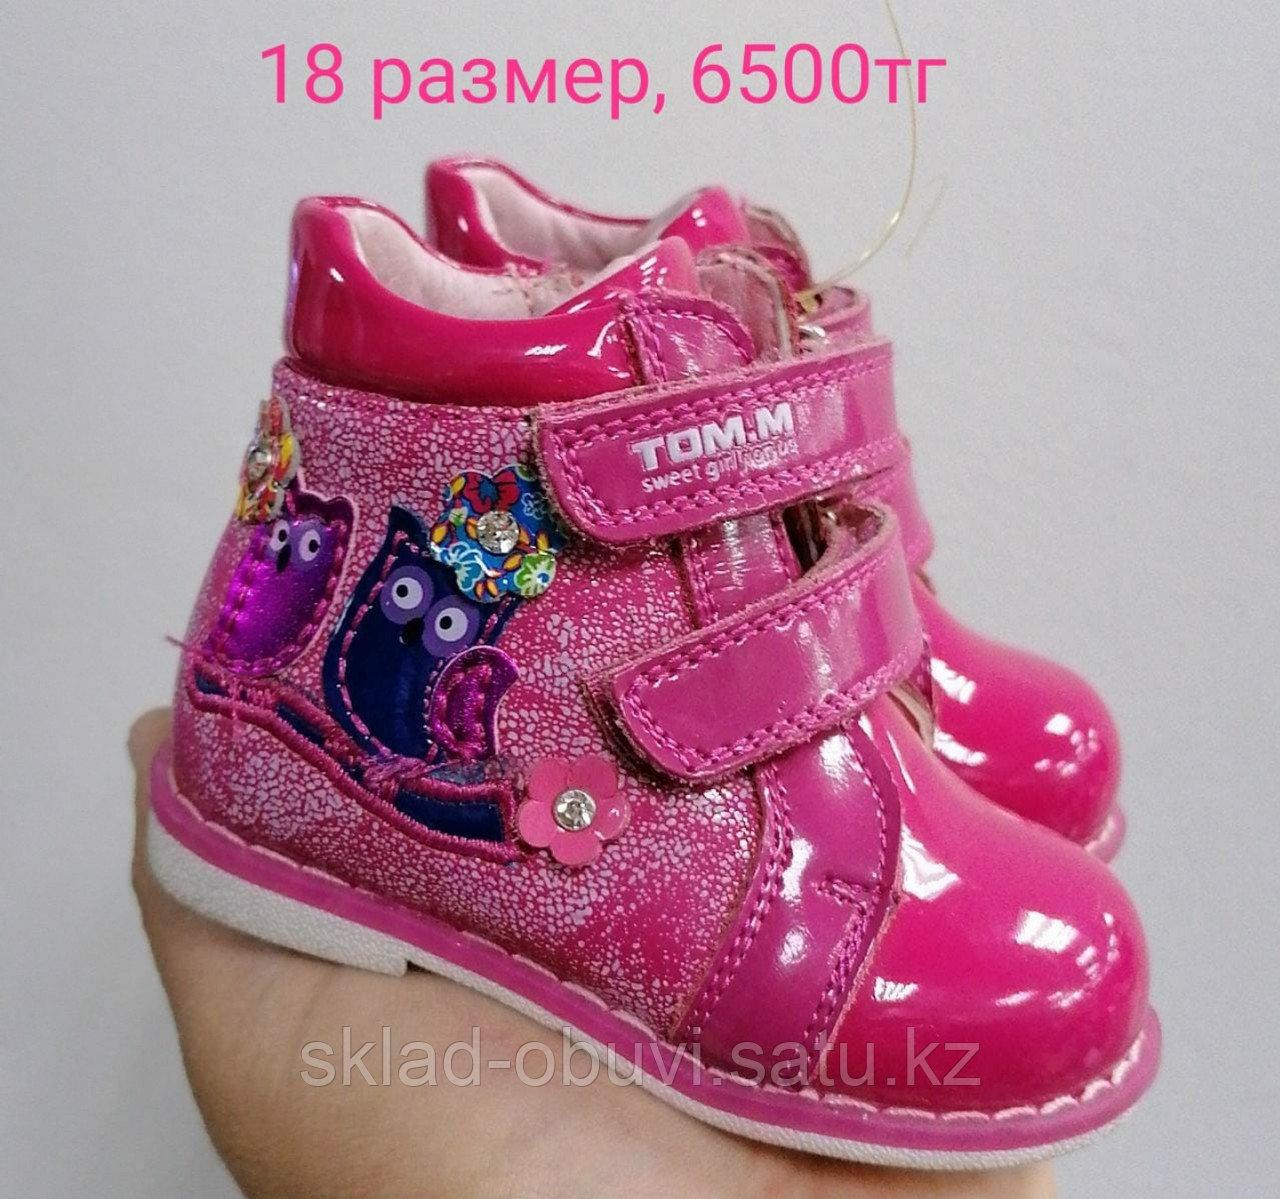 Flamingo. Ботинки детям. - фото 3